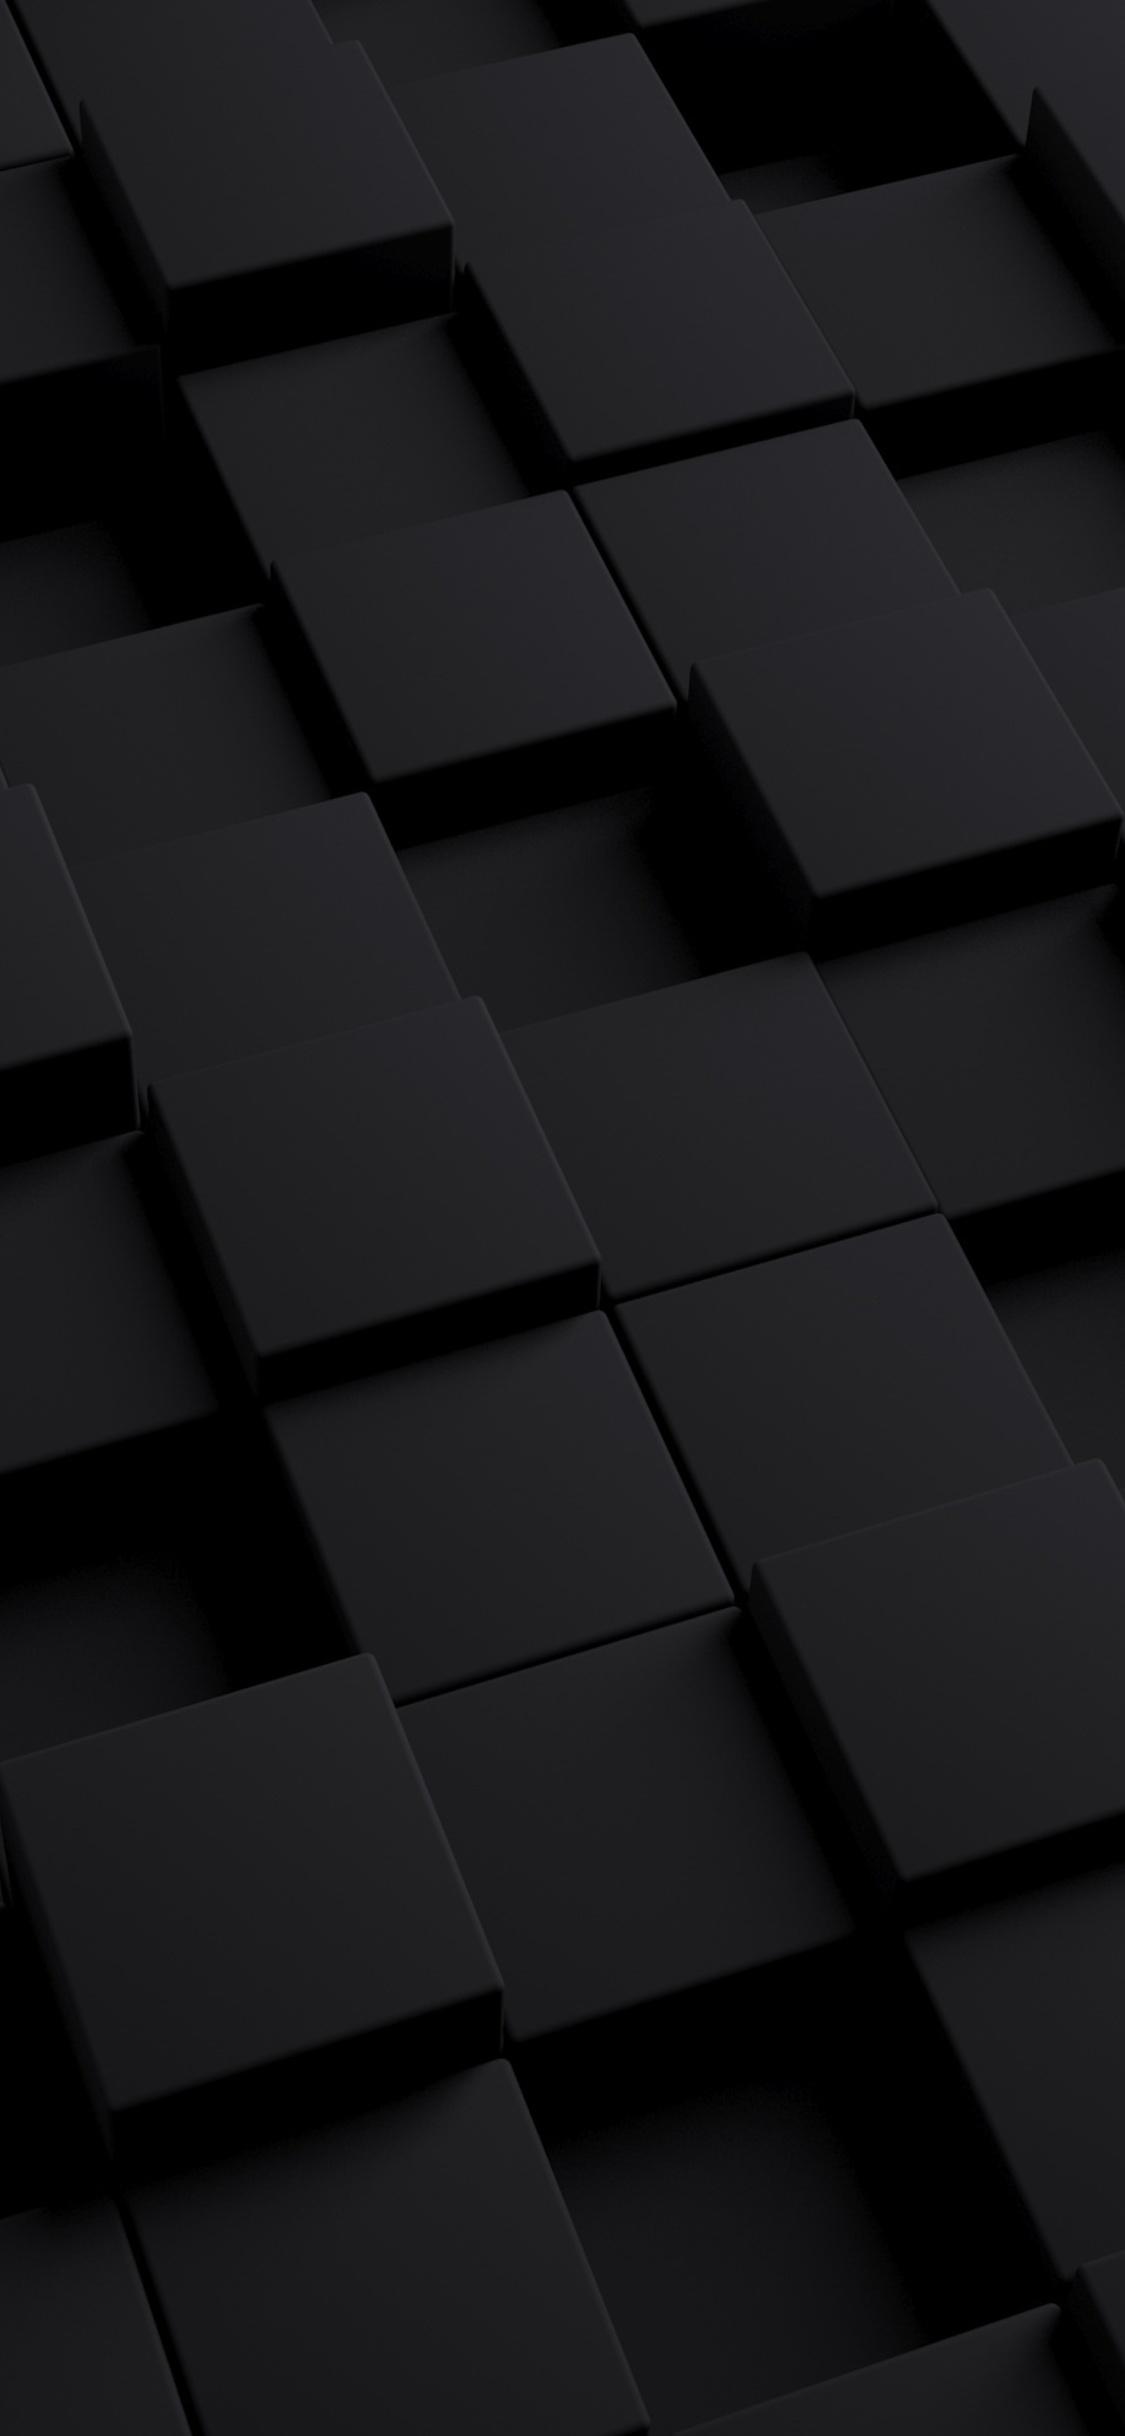 Bimbit Murah Ada Disini Iphone Xs Black Wallpaper 4k